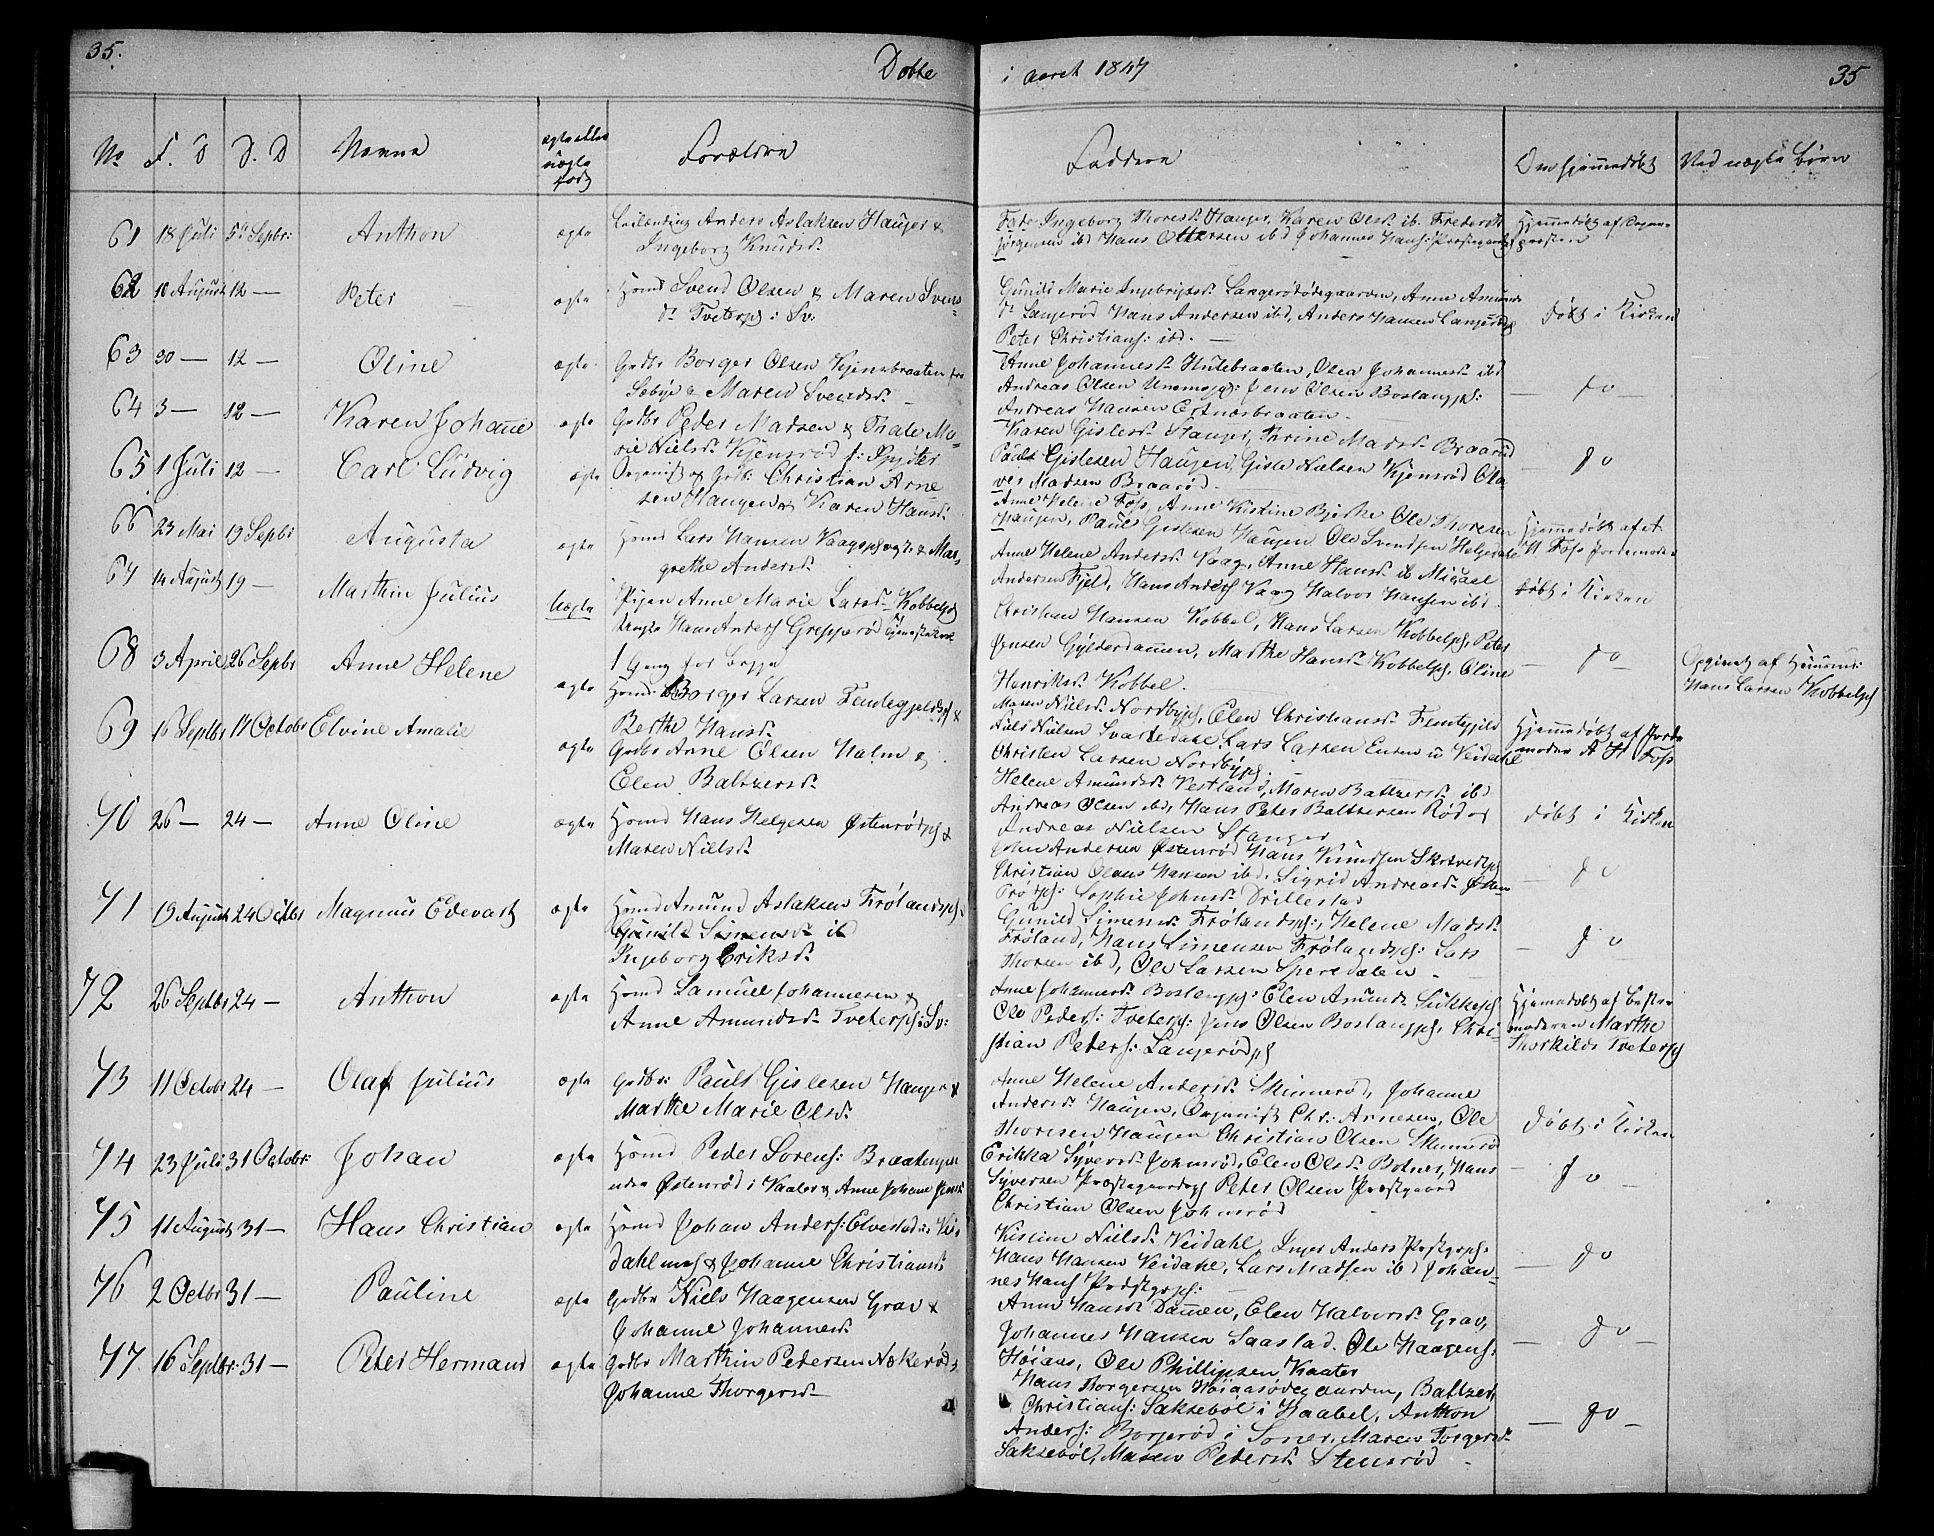 SAO, Våler prestekontor Kirkebøker, G/Ga/L0002: Klokkerbok nr. I 2, 1839-1860, s. 35